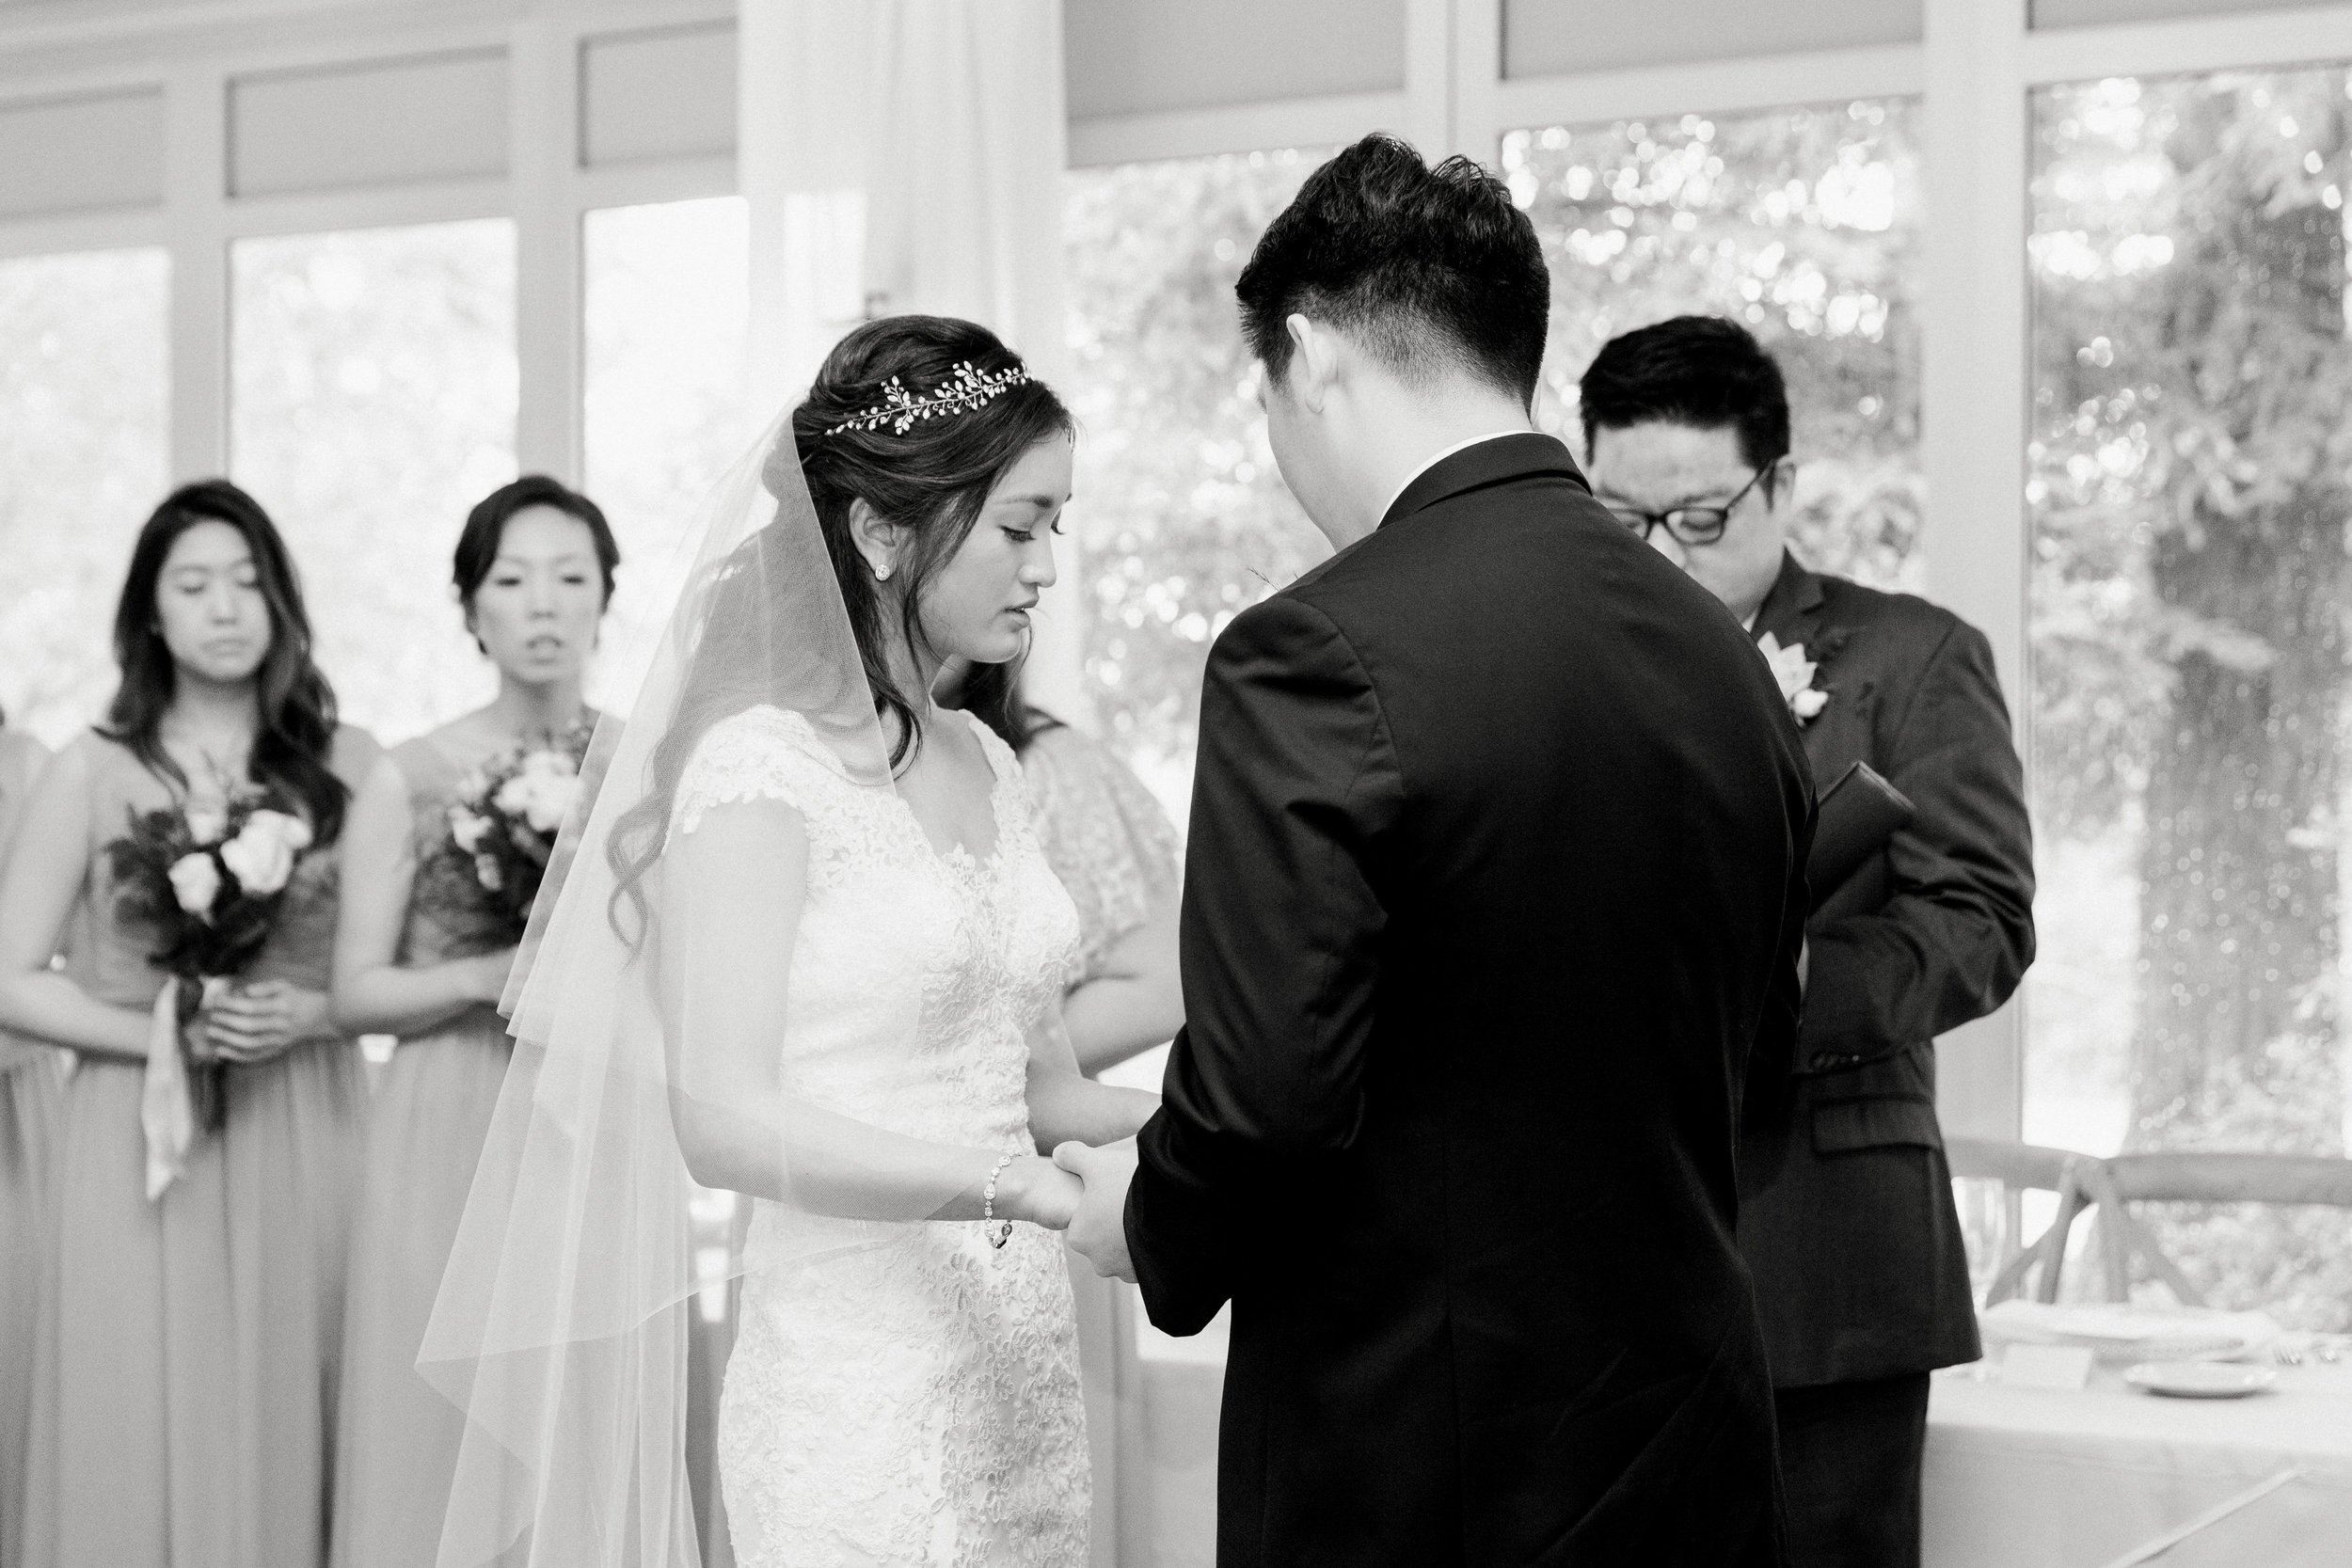 JA_Wedding_Ceremony_040.jpg